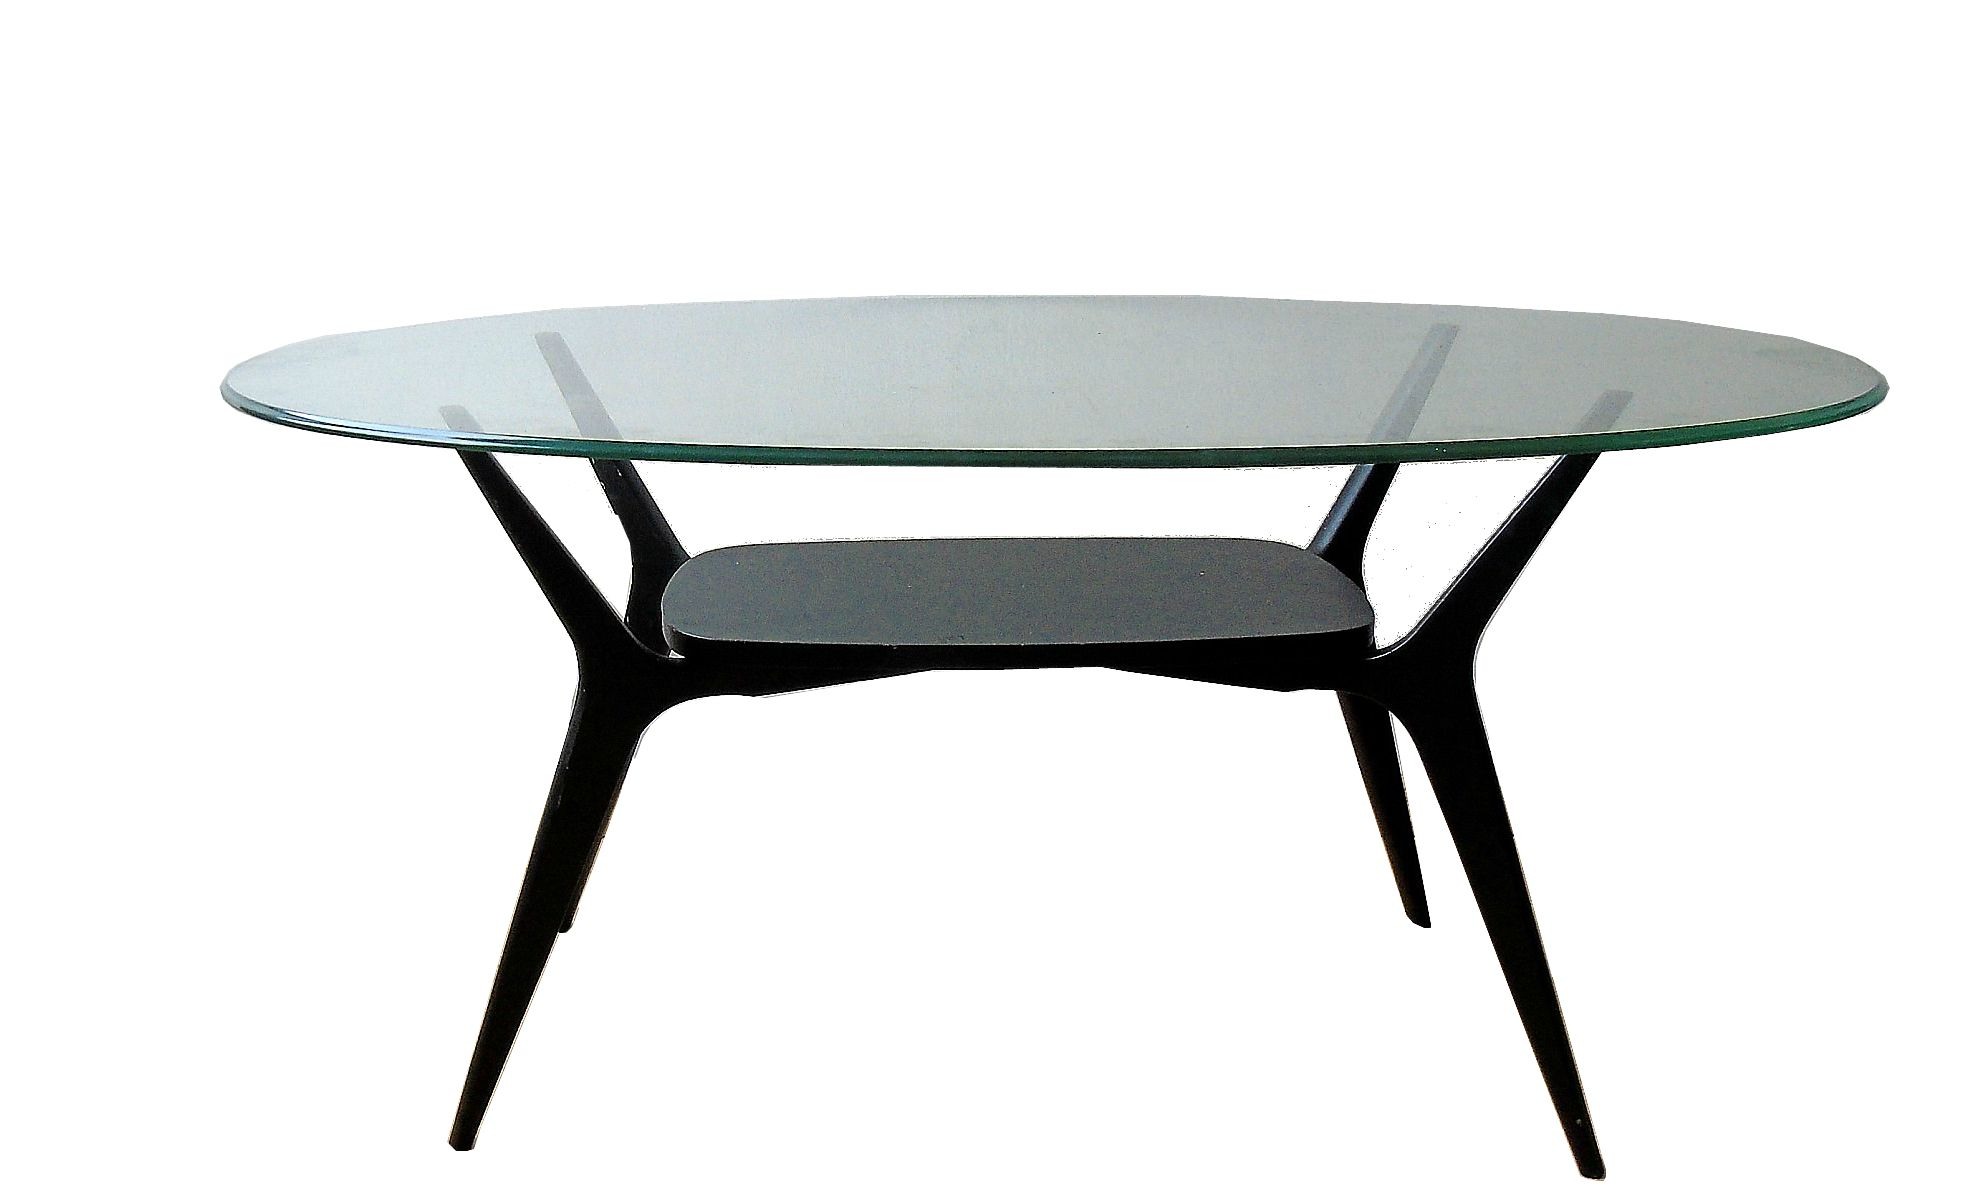 Mid Century Belgian Coffee Table By Alfred Hendrickx 1950s Salontafel Tafel 2 Mid Century Modern [ 1191 x 1961 Pixel ]